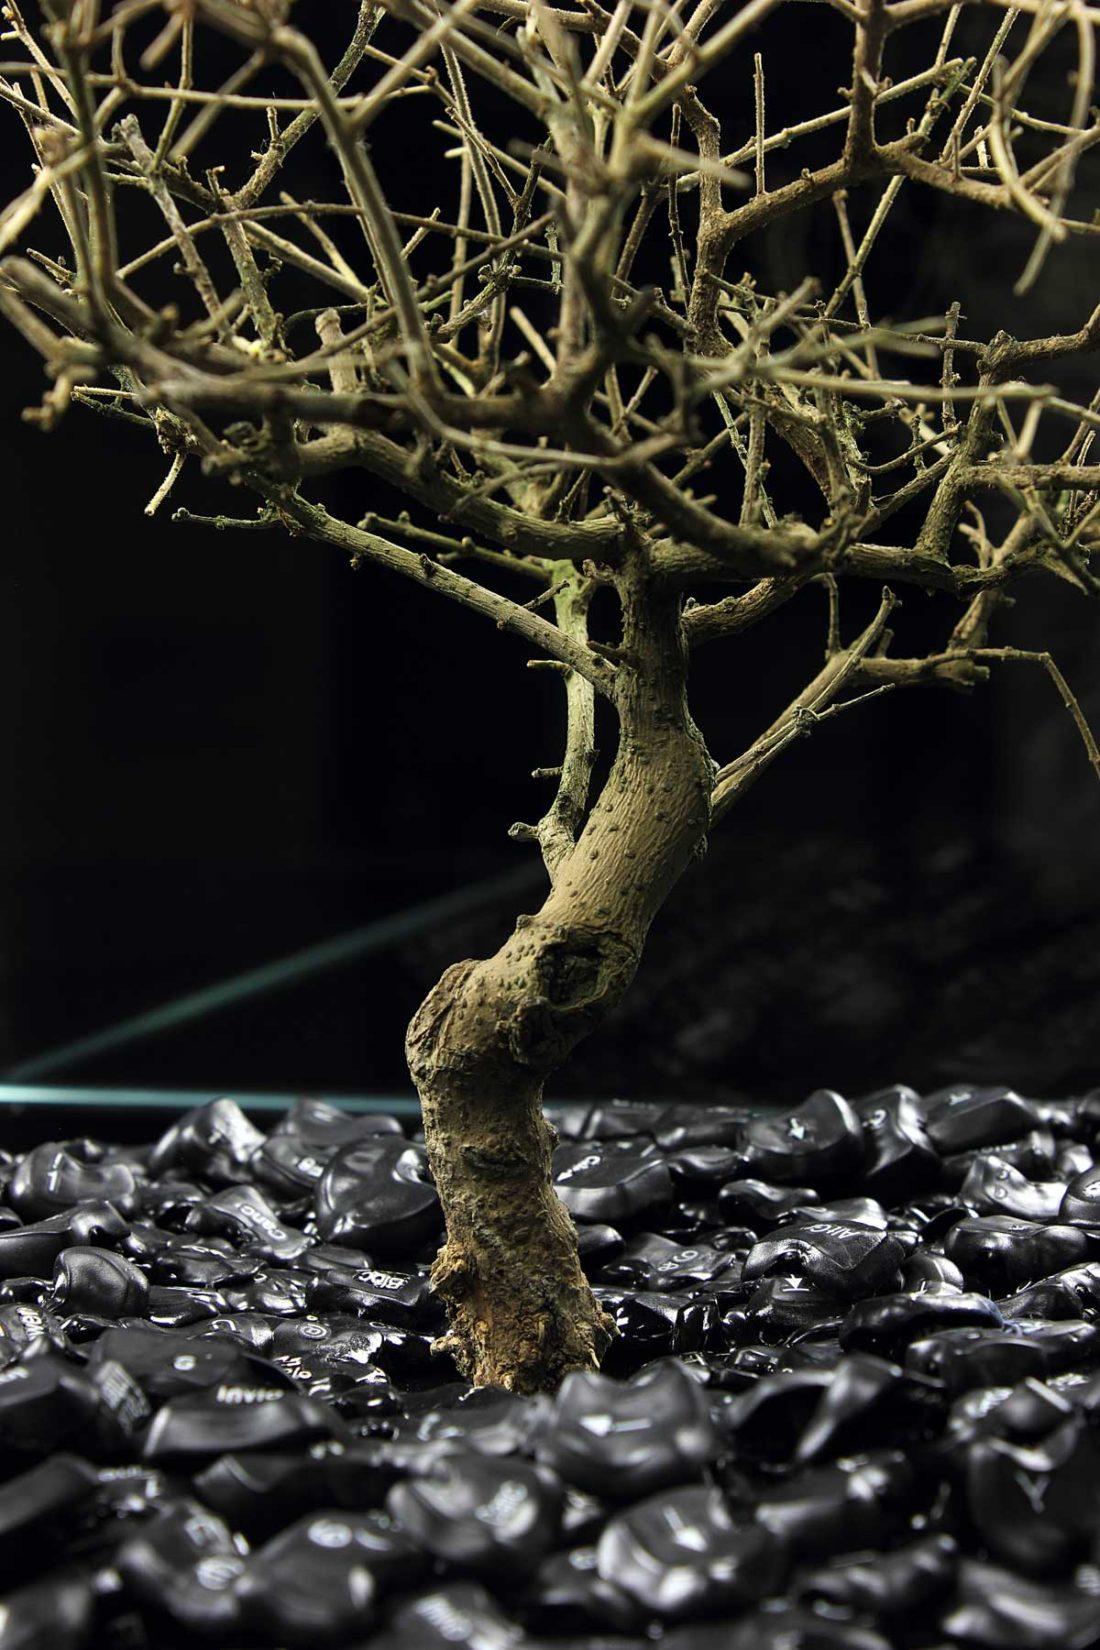 detail artwork bonsai - keyboard buttons created by meimorettini duo italian artists